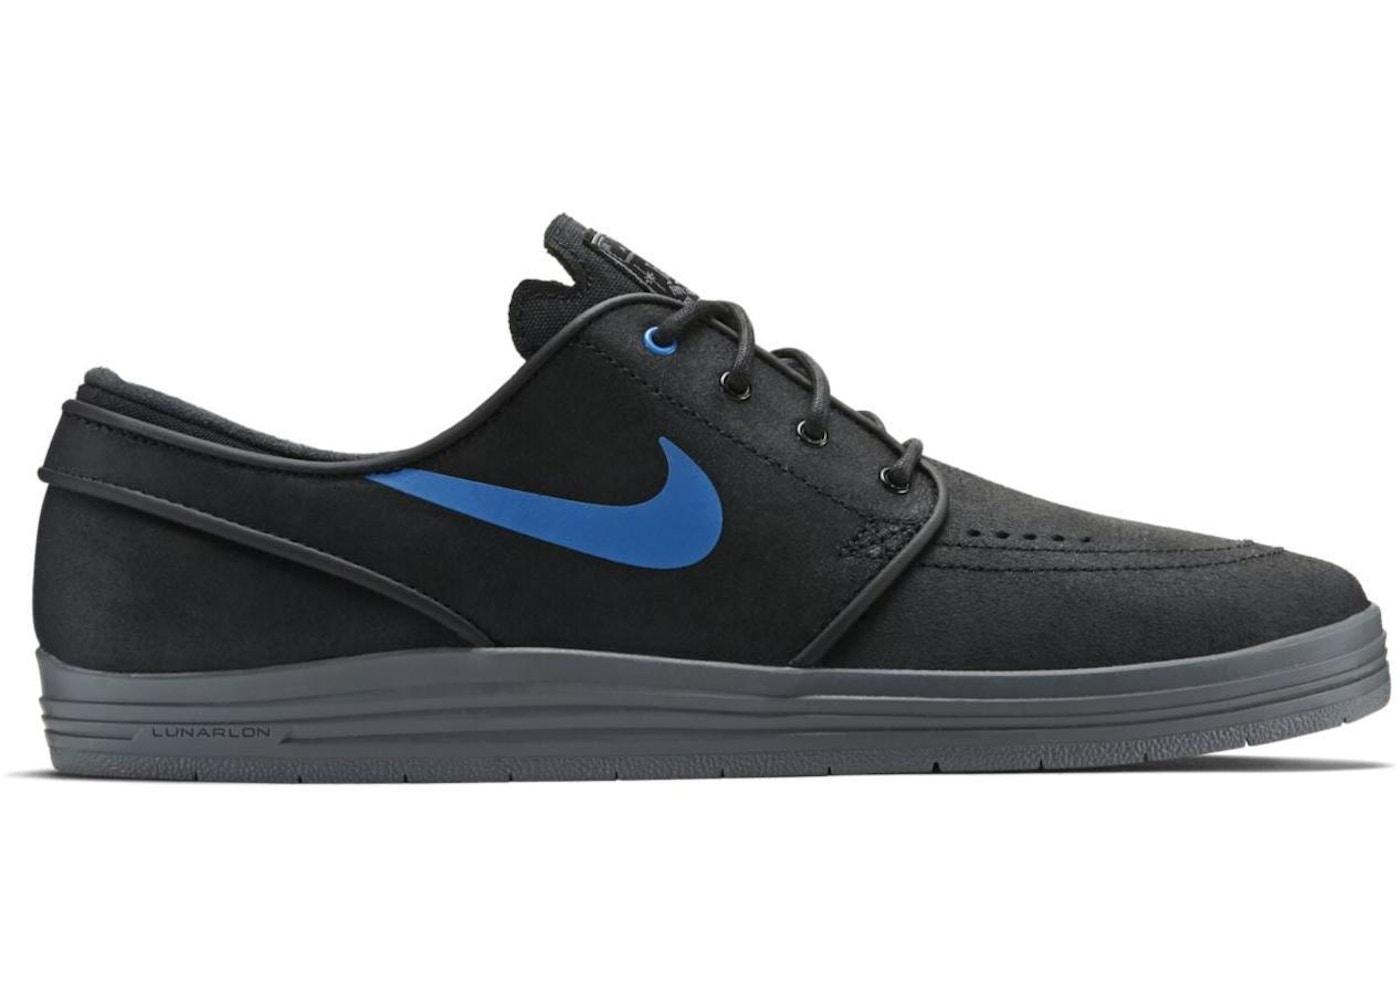 new concept e54c4 72ad6 Nike SB Stefan Janoski Lunar Black Cool Grey - 654857-040